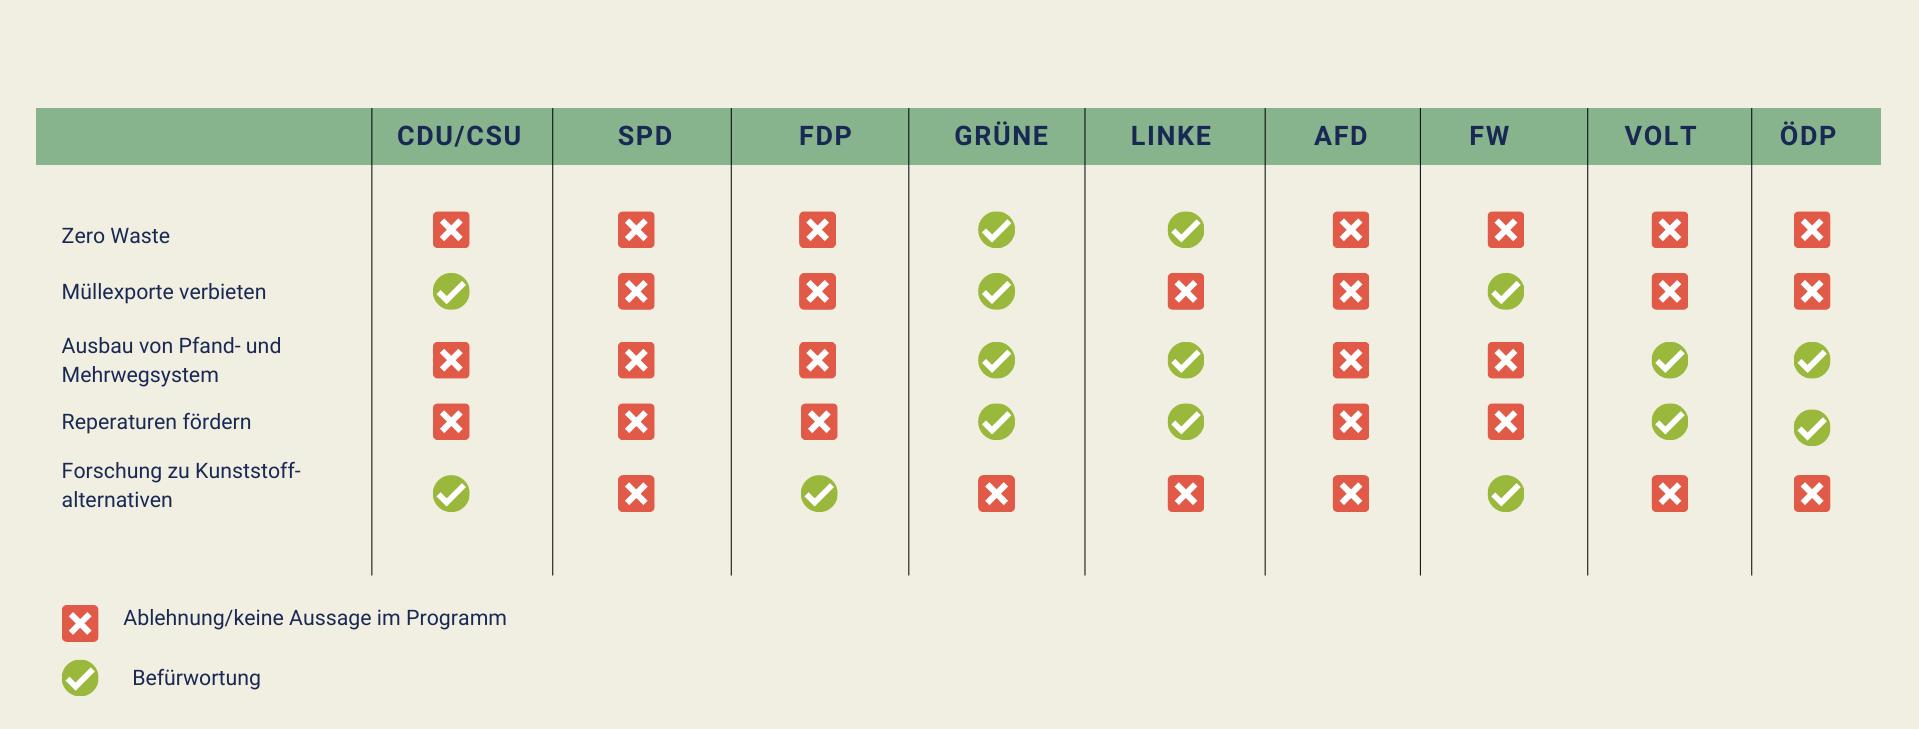 Bundestagswahl Klimawandel Klimaneutralität CDU Grüne FDP AfD Linke ÖDP Volt Freie Wähler